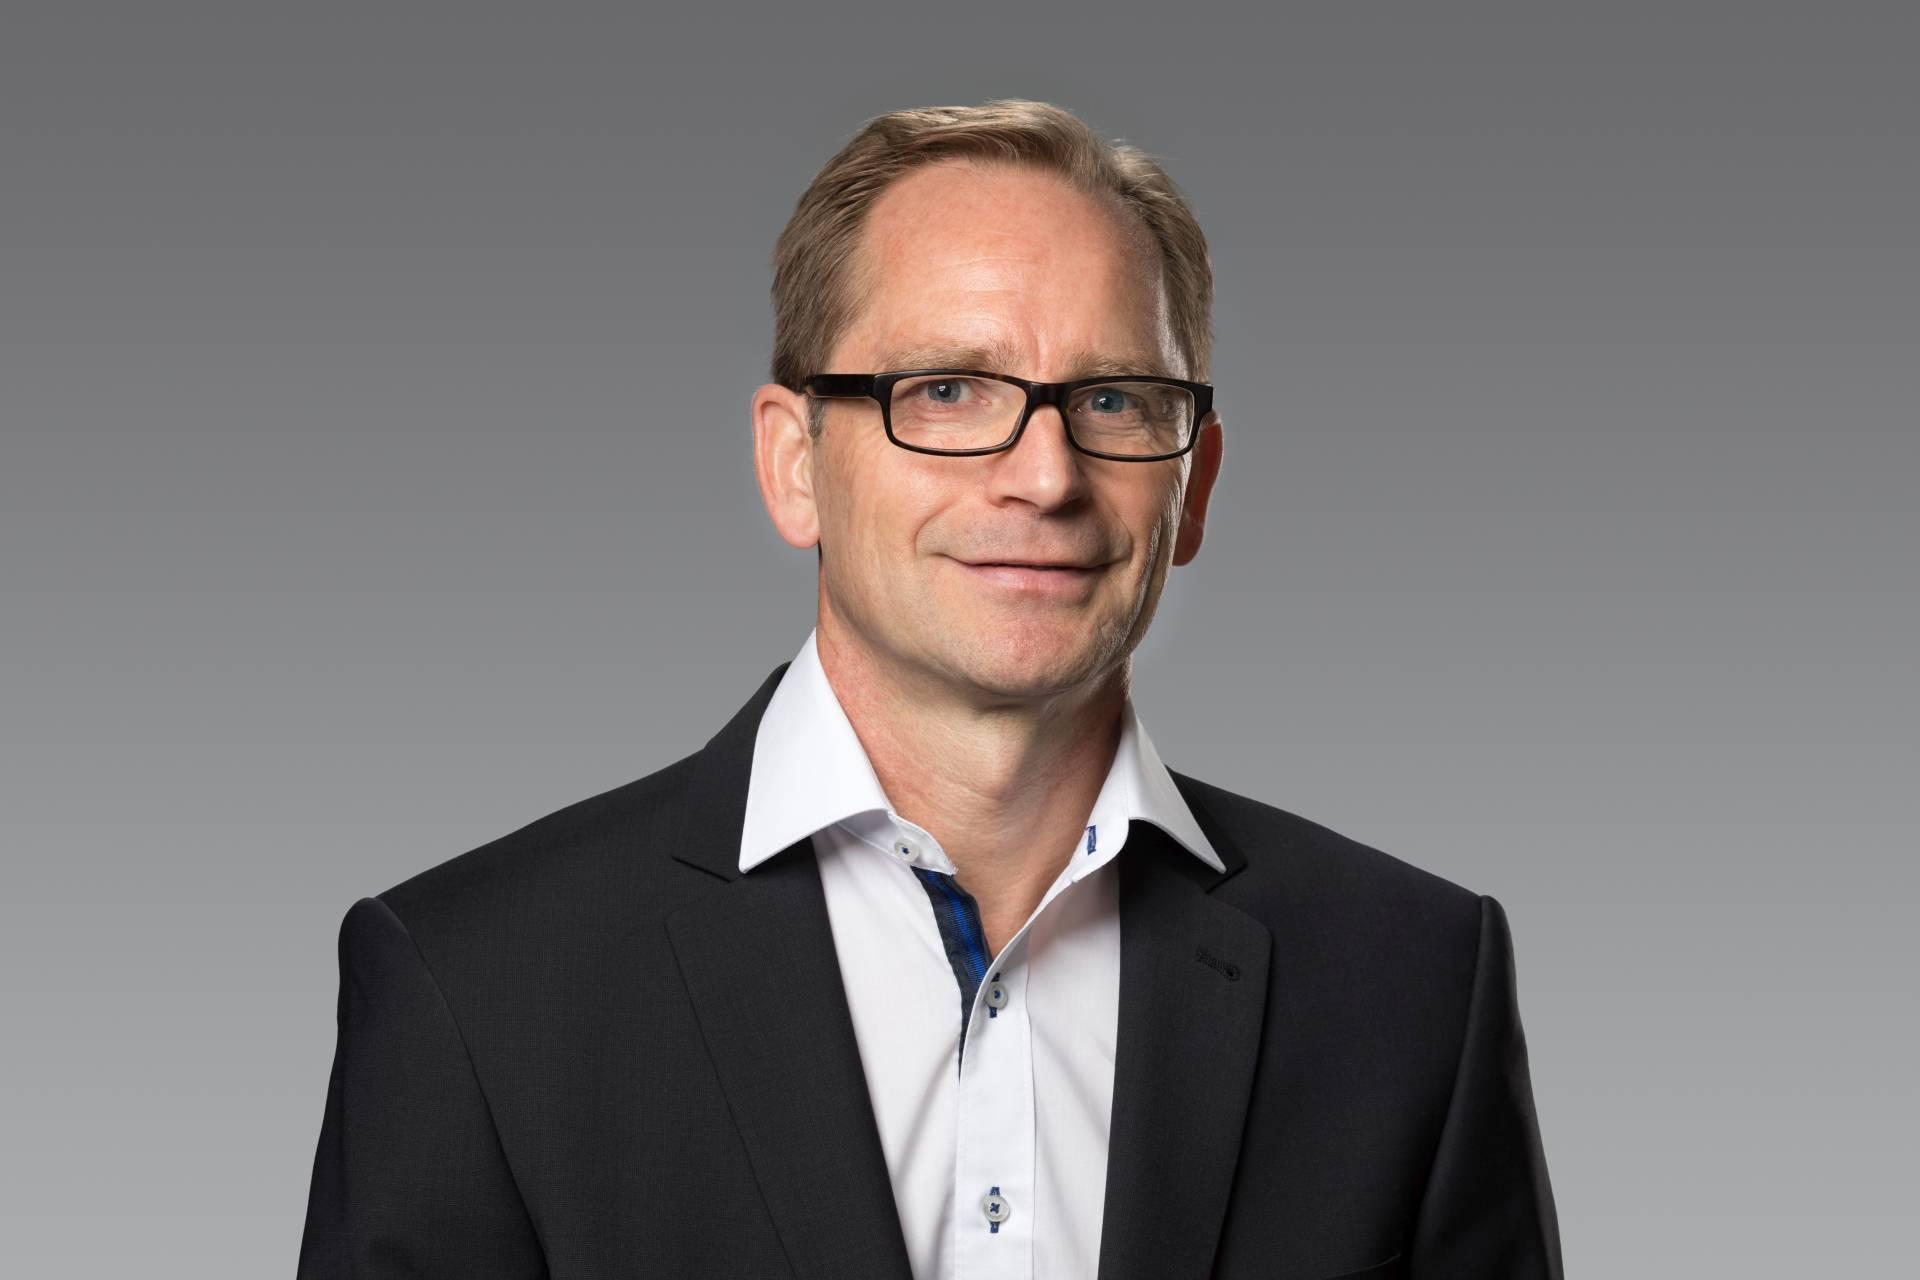 Michael Schäffler